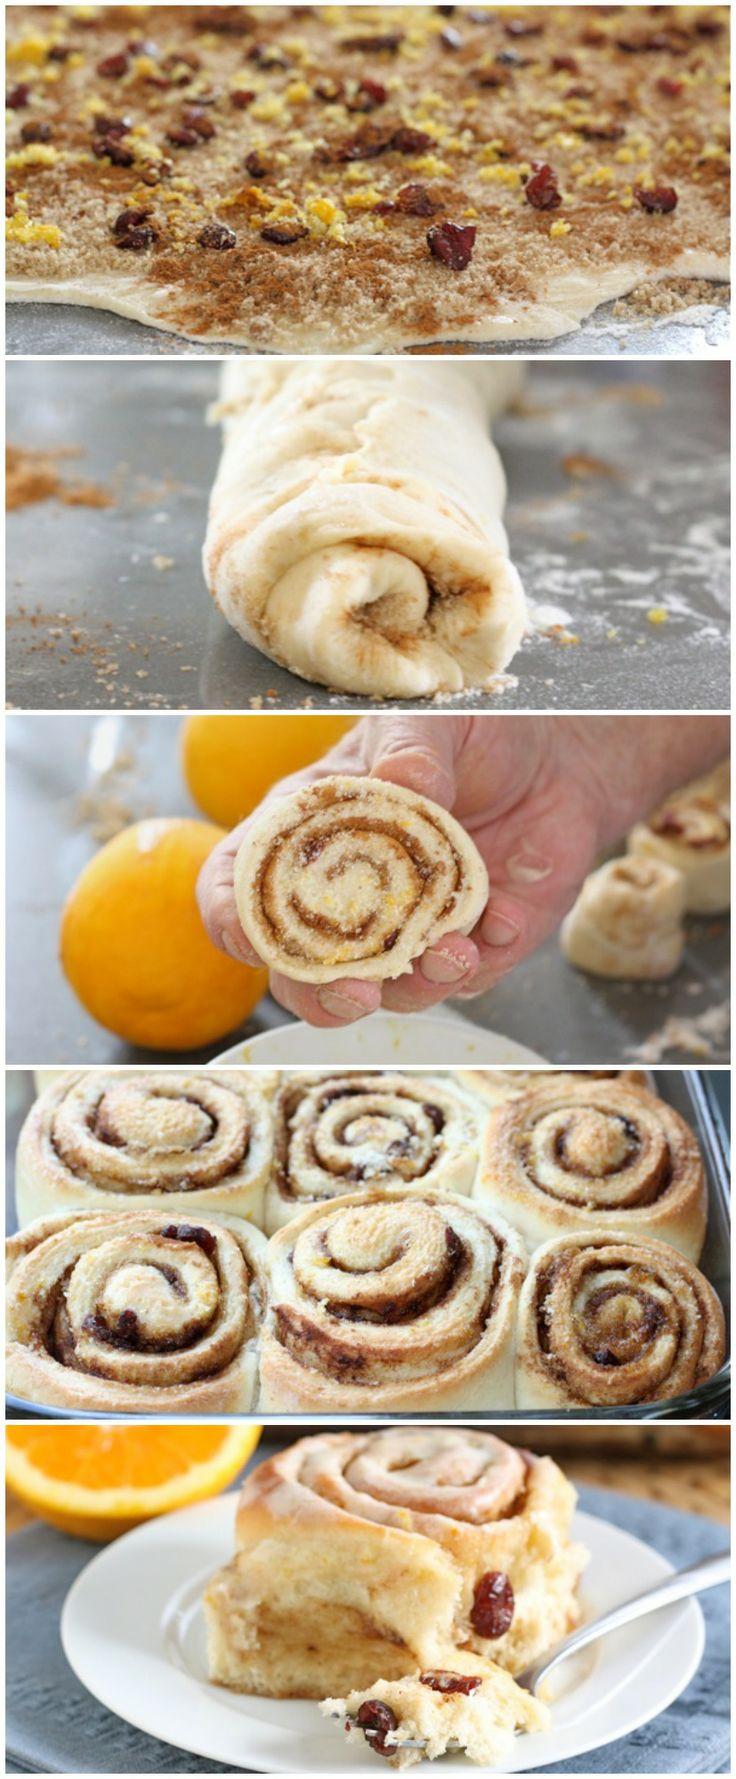 Cranberry Orange Cinnamon Roll Recipe on twopeasandtheirpod.com The perfect cinnamon rolls for the holidays!